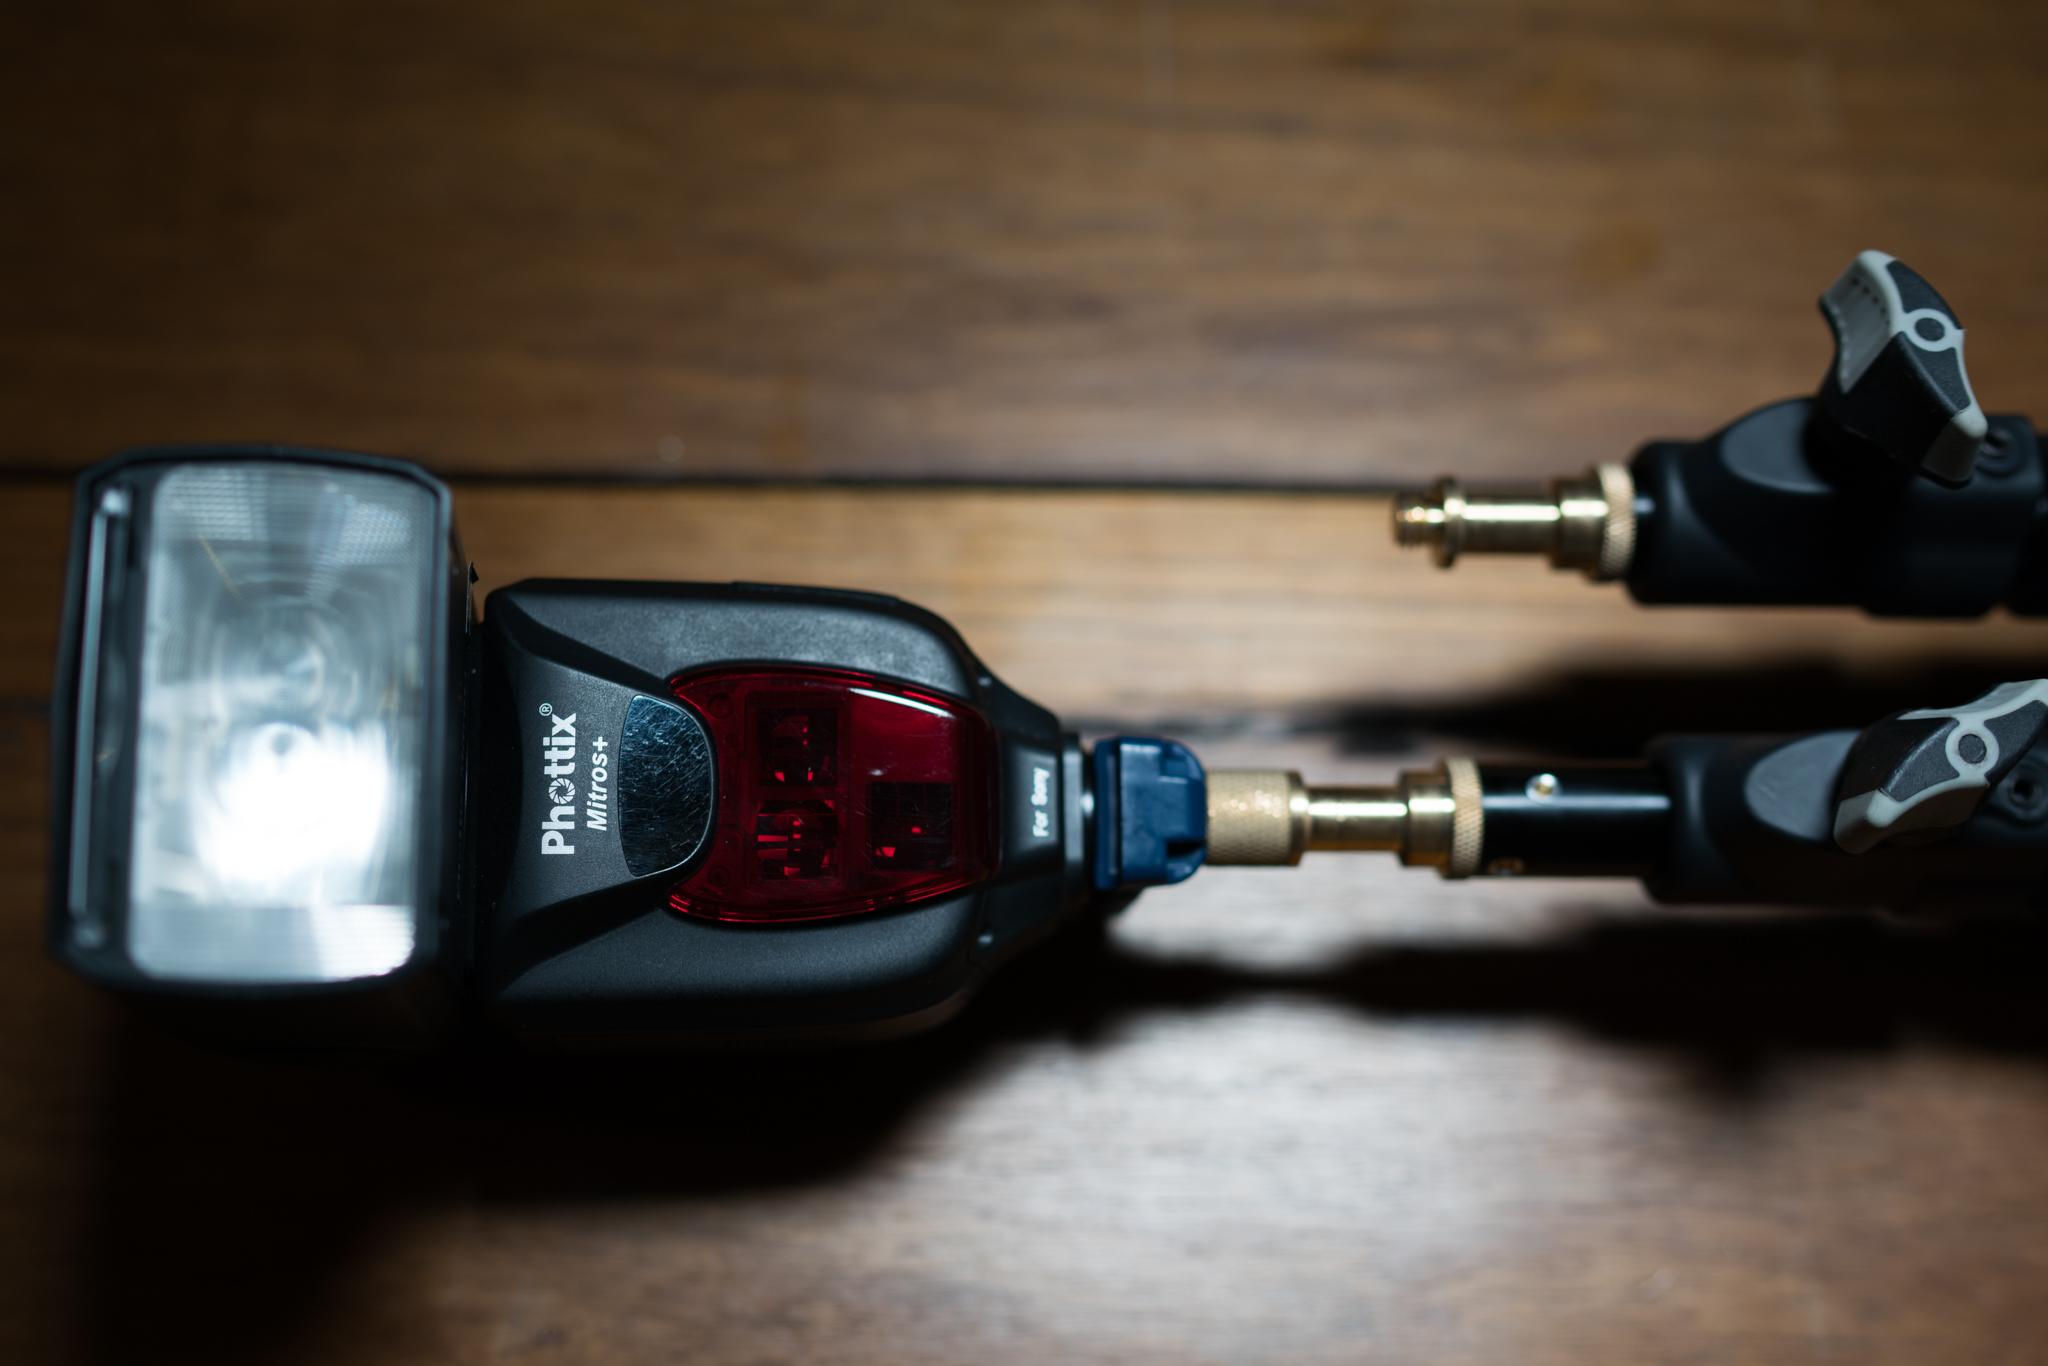 Kupo click light stand